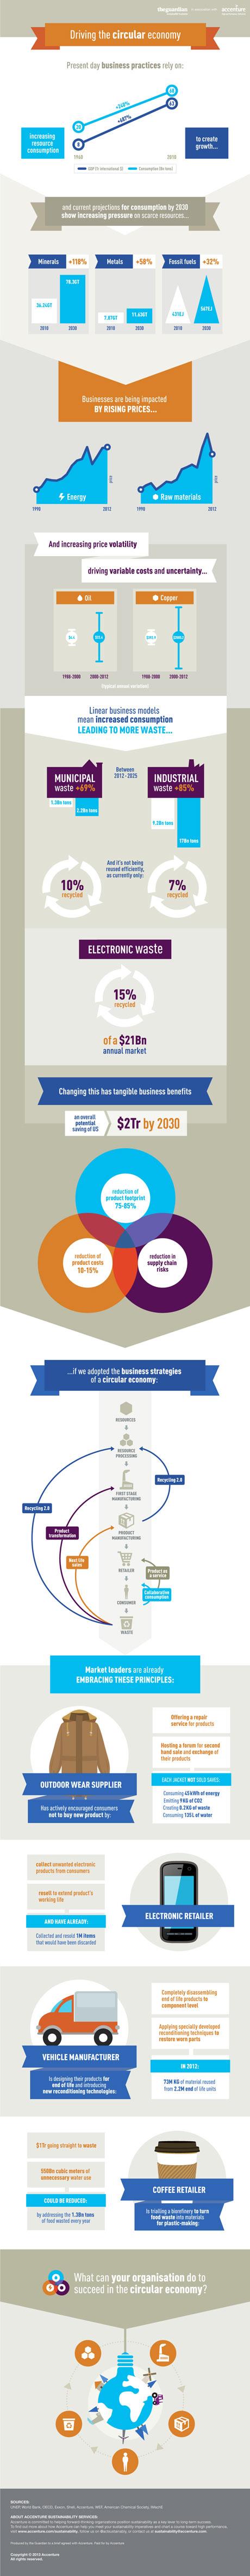 Driving The Circular Economy Infographic Inspiration Ideer